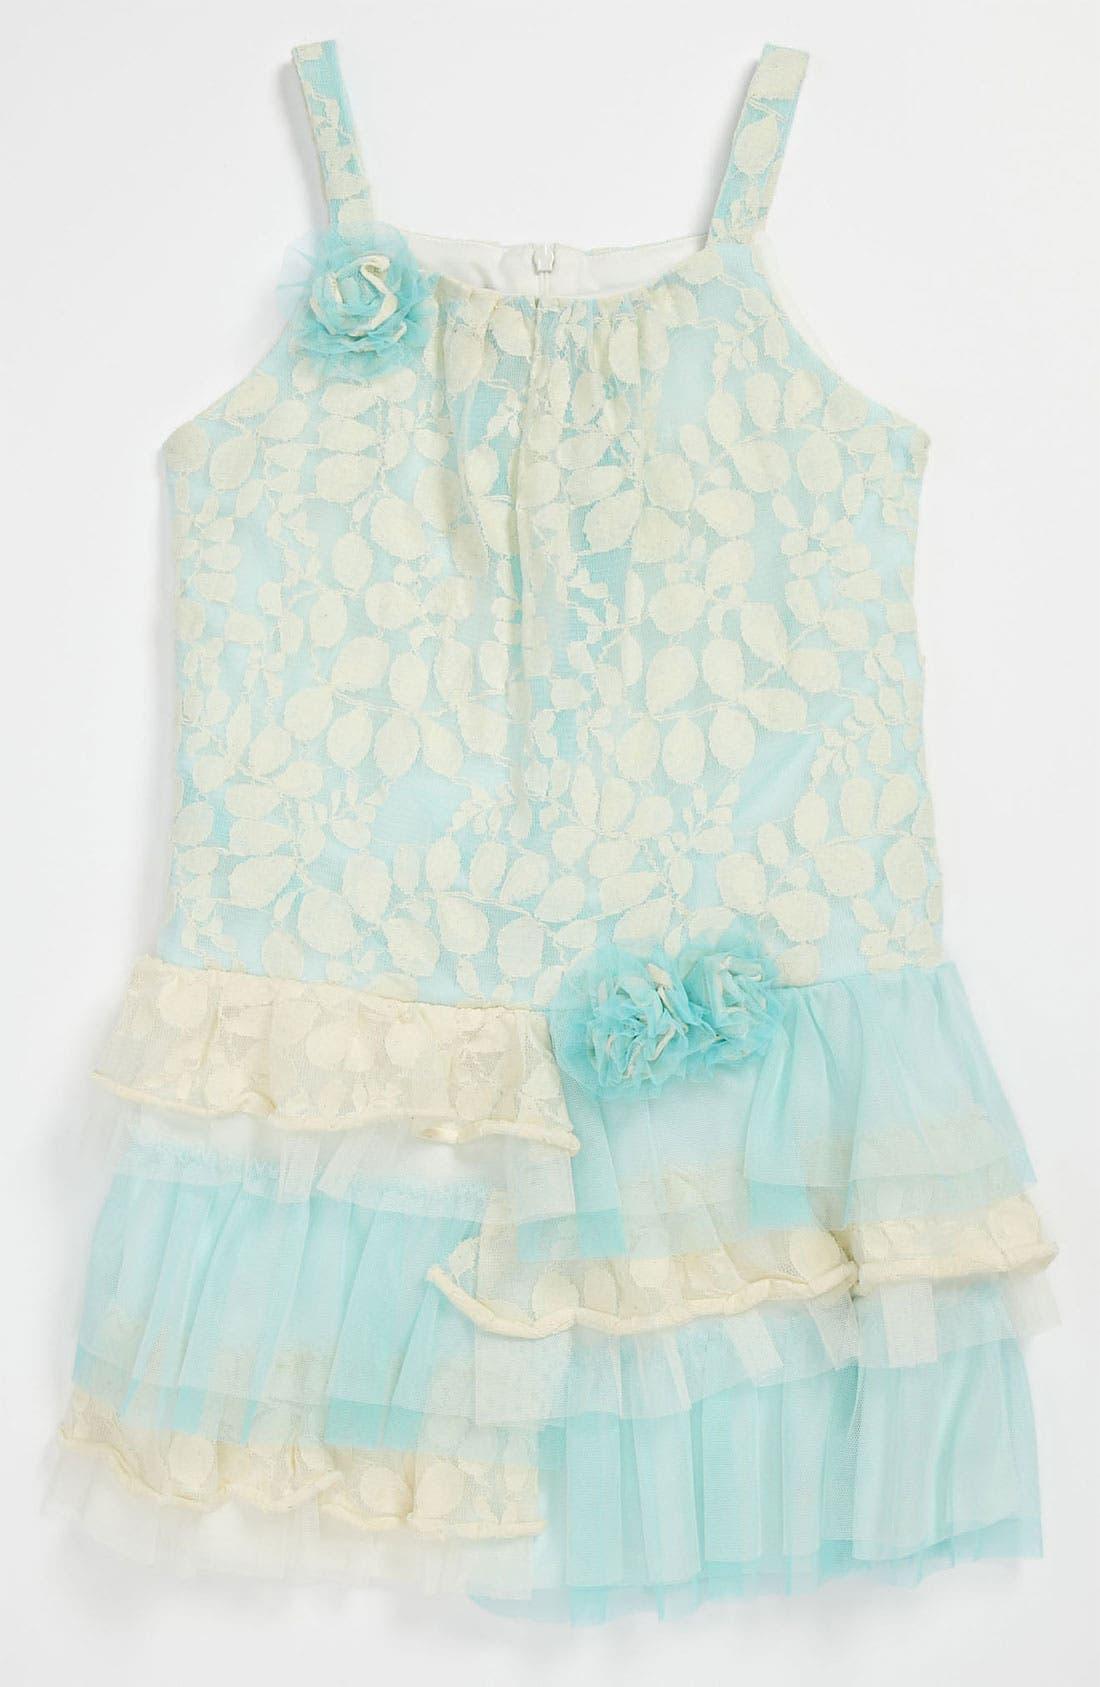 Alternate Image 1 Selected - Isobella & Chloe Lace Dress (Little Girls & Big Girls)